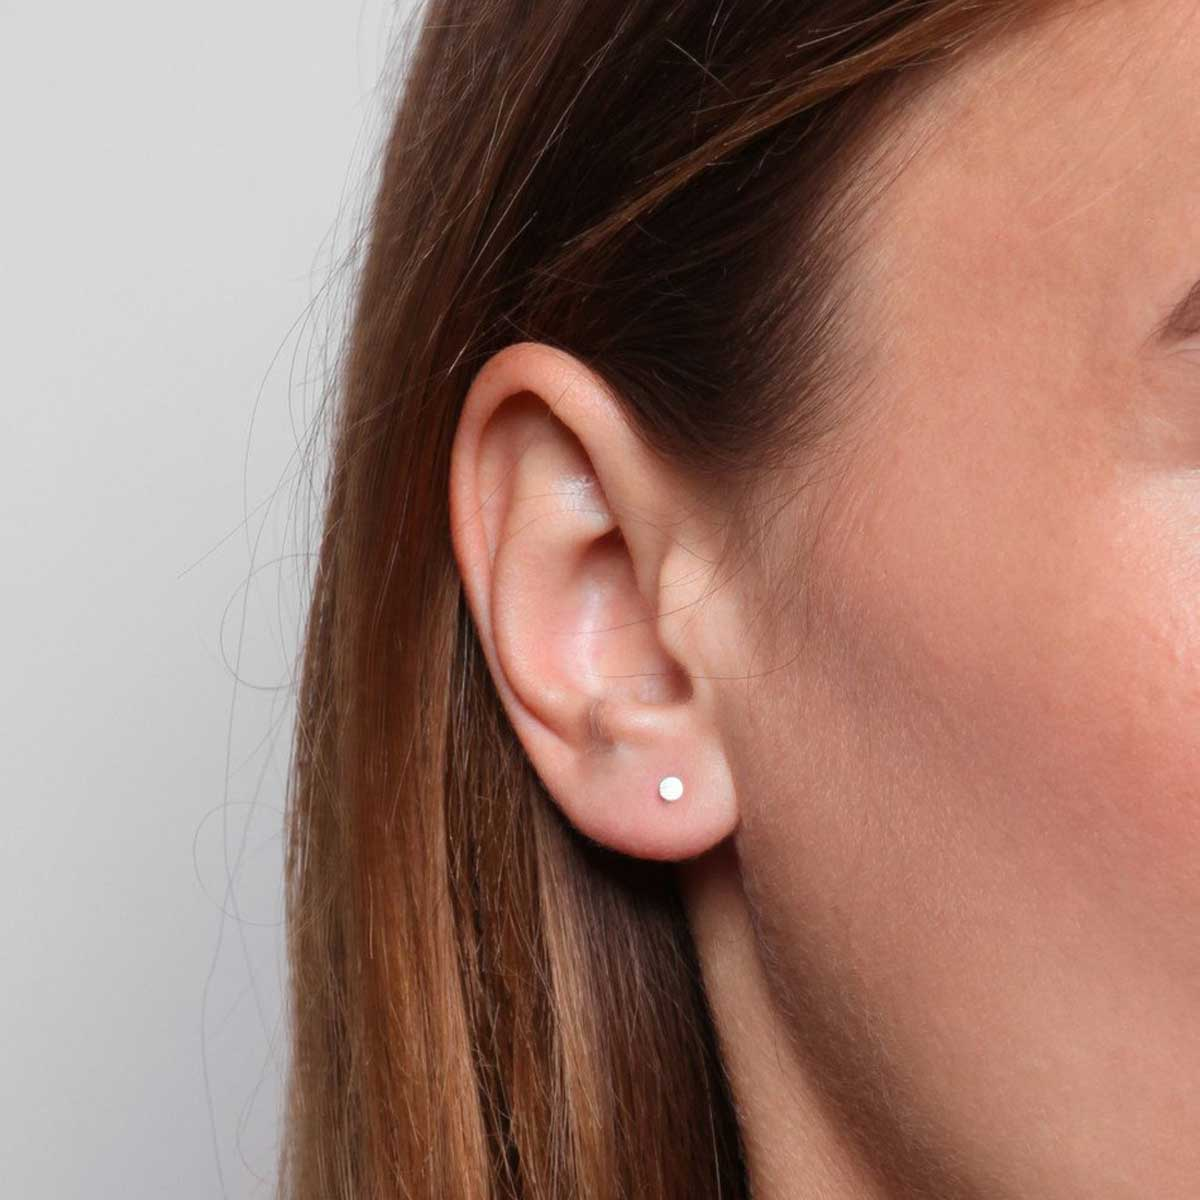 gold tiny circle stud earrings hopscotch